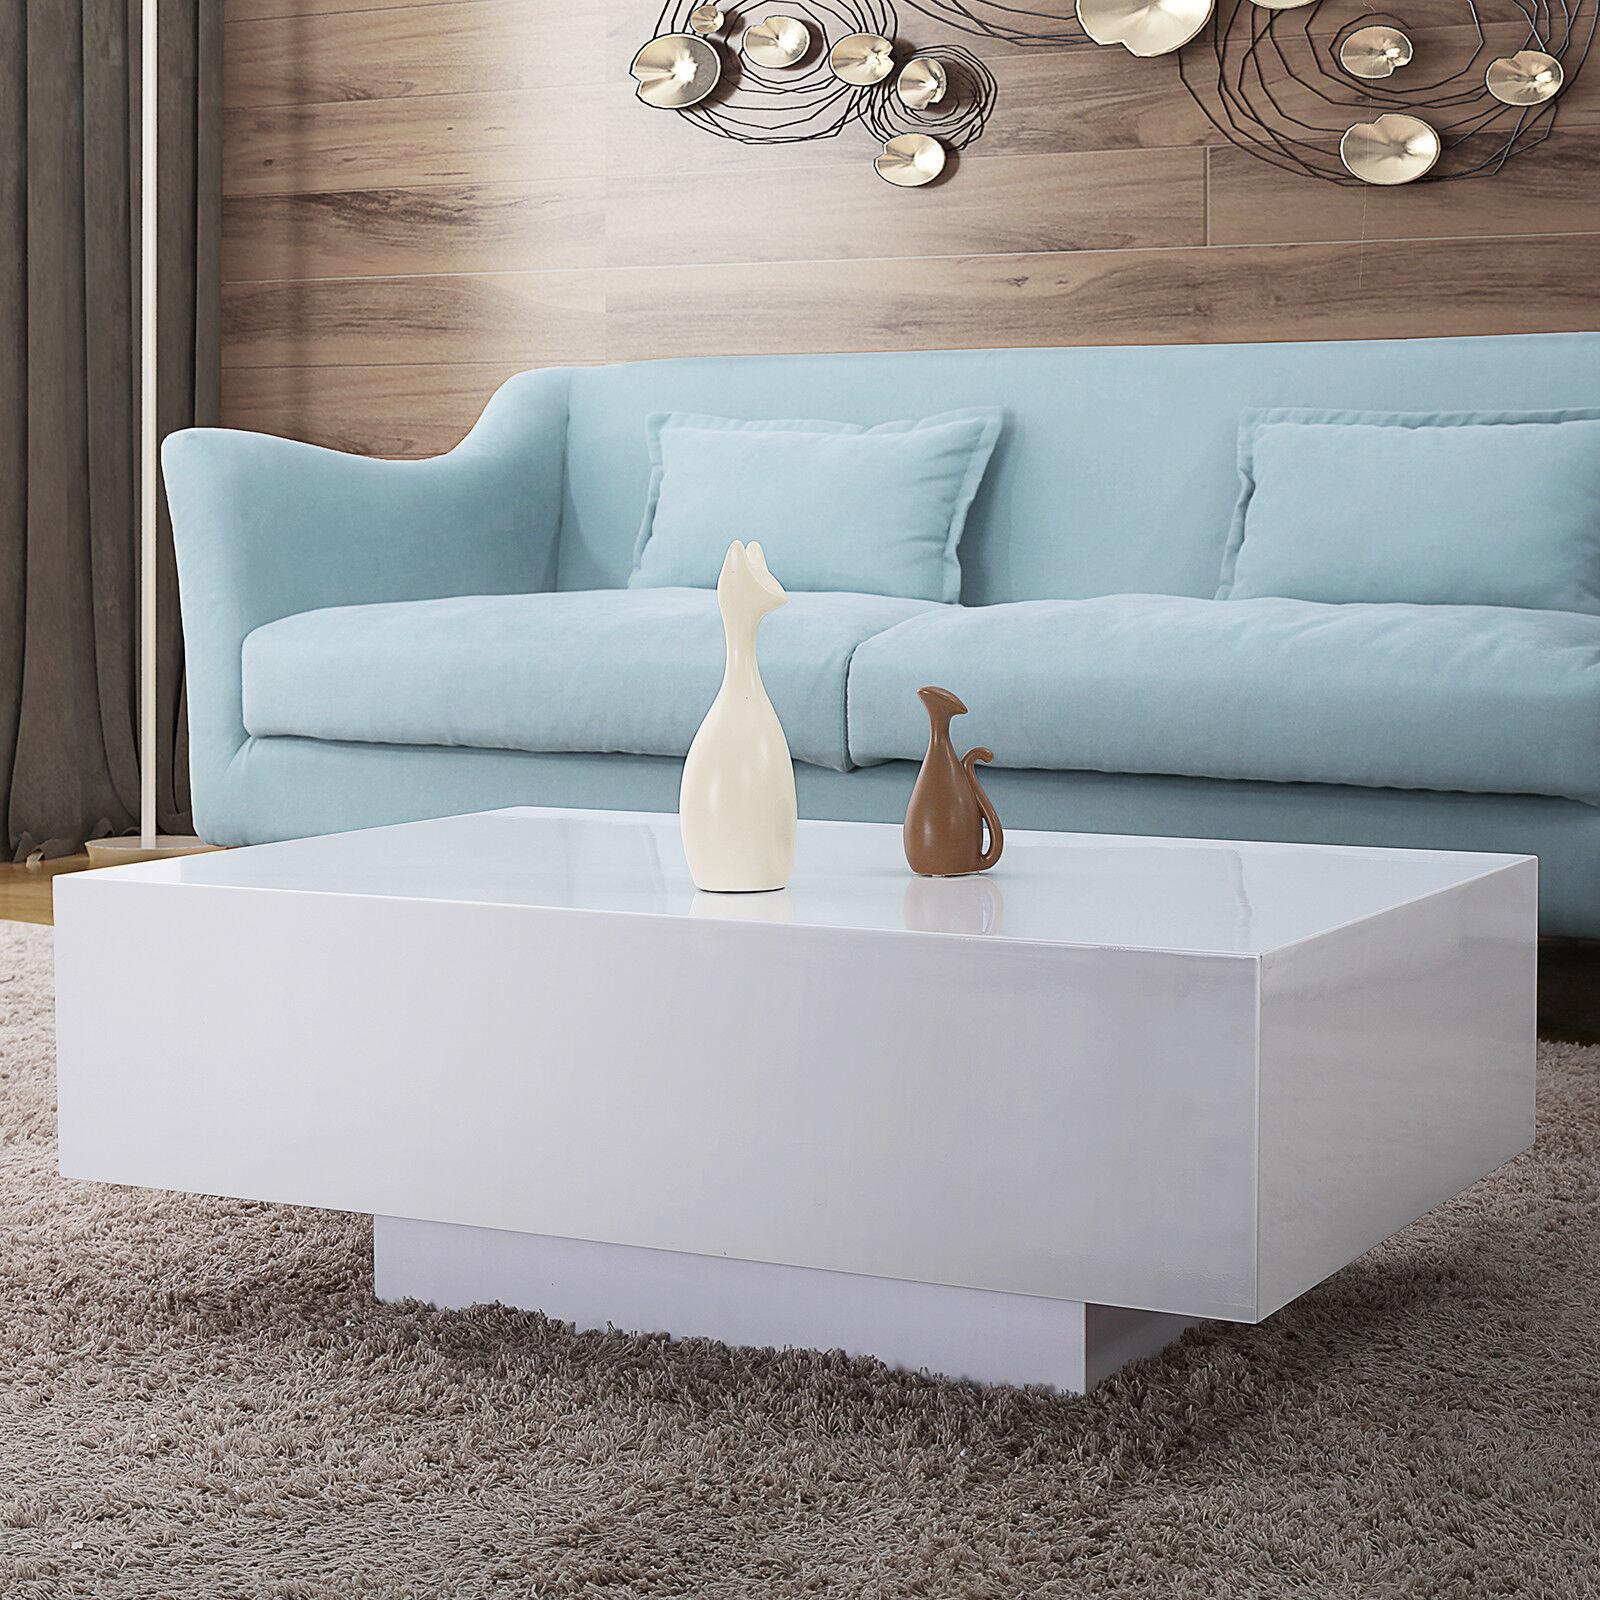 Modern high gloss white coffee table rectangle living room furniture l85cm